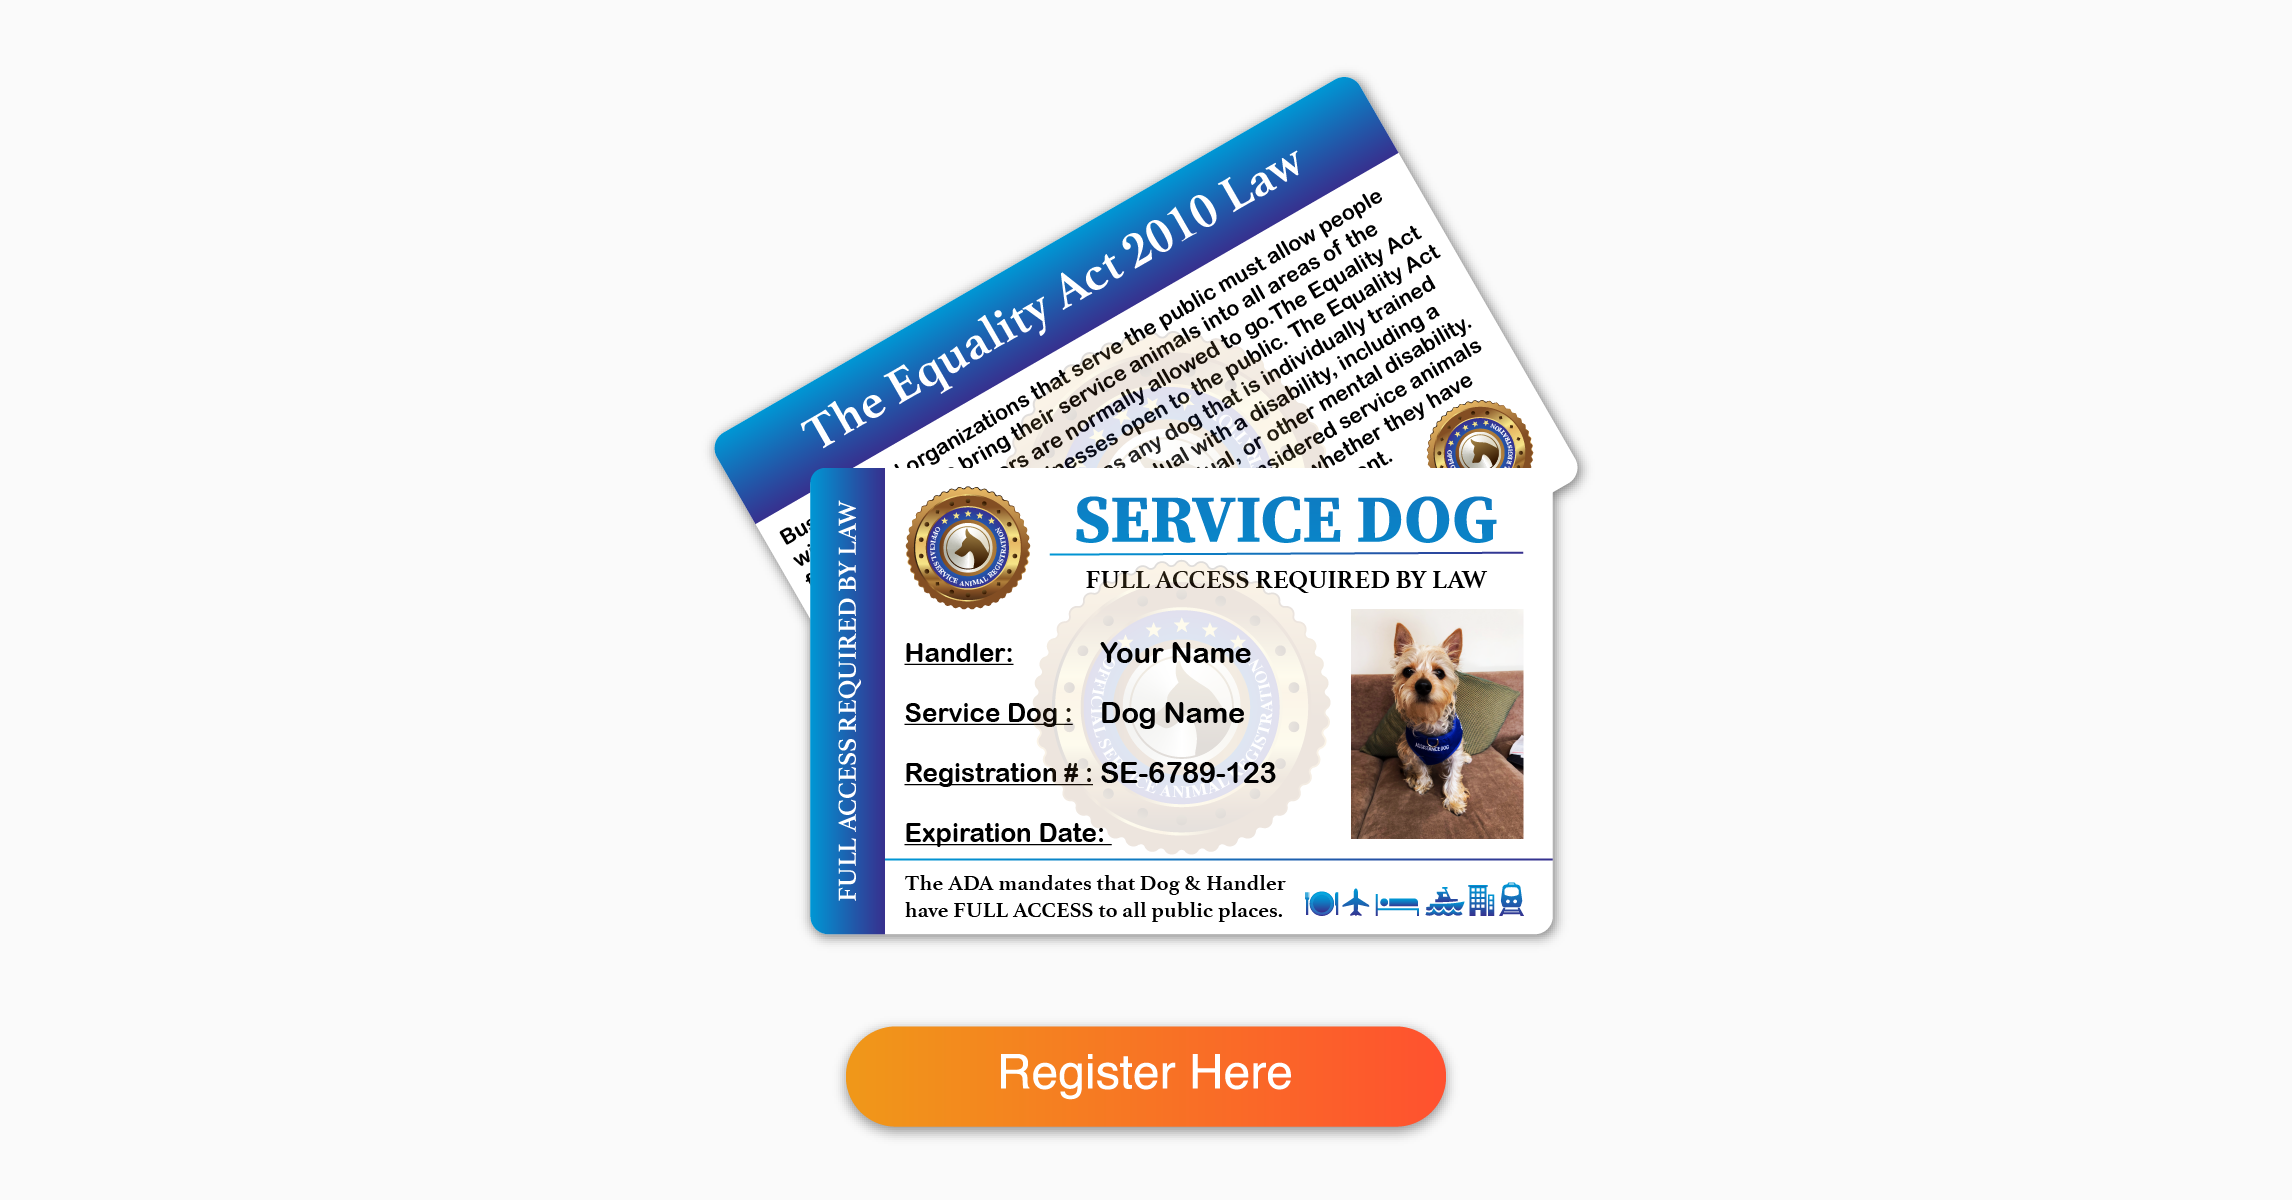 Service Dog Identification